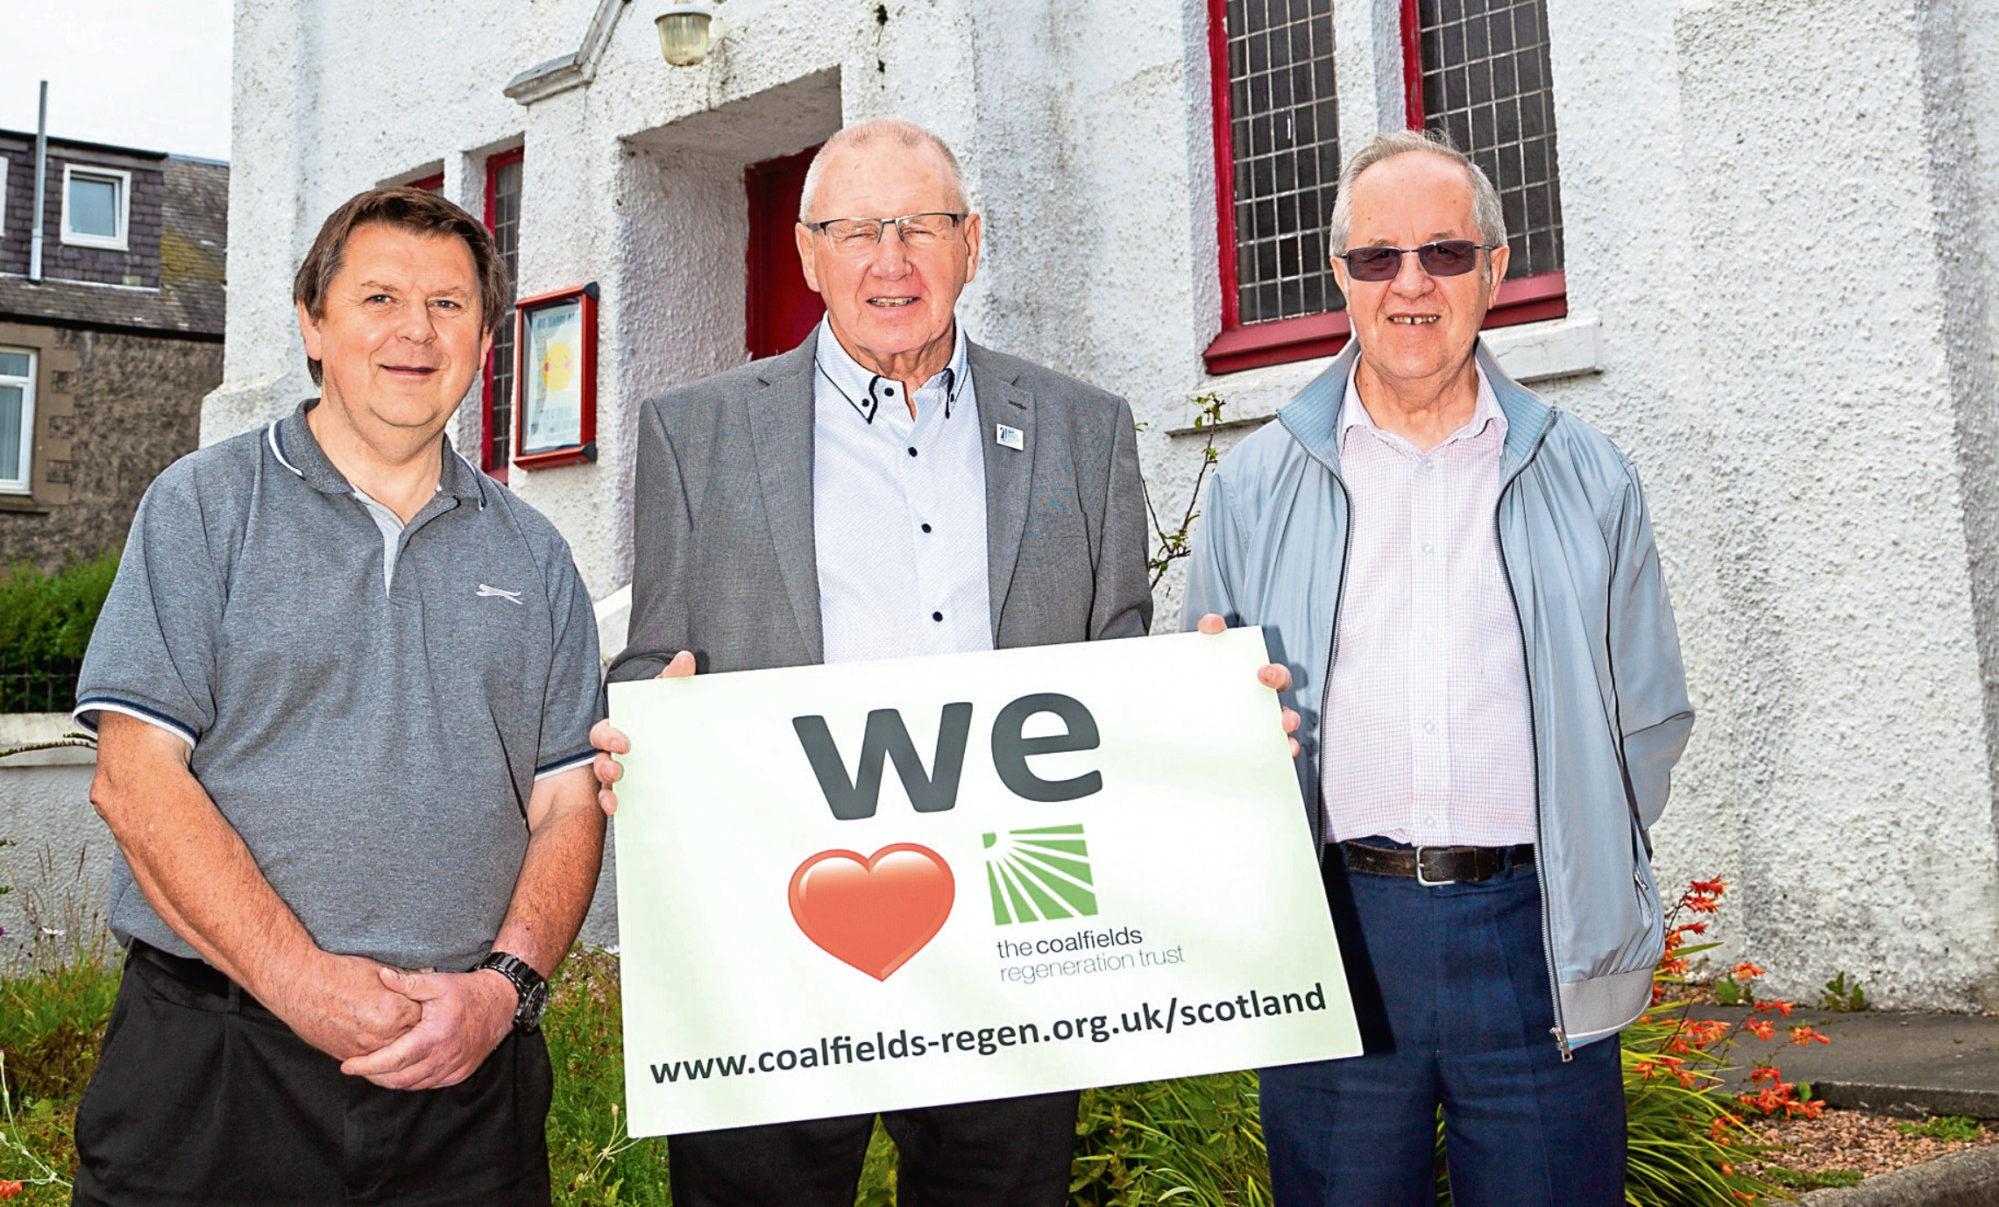 Image shows (left to right):  Robert Scott (Buckhaven Baptist Church), Bob Young (CRT Scotland trustee), David Dowie,  (Buckhaven Baptist Church).